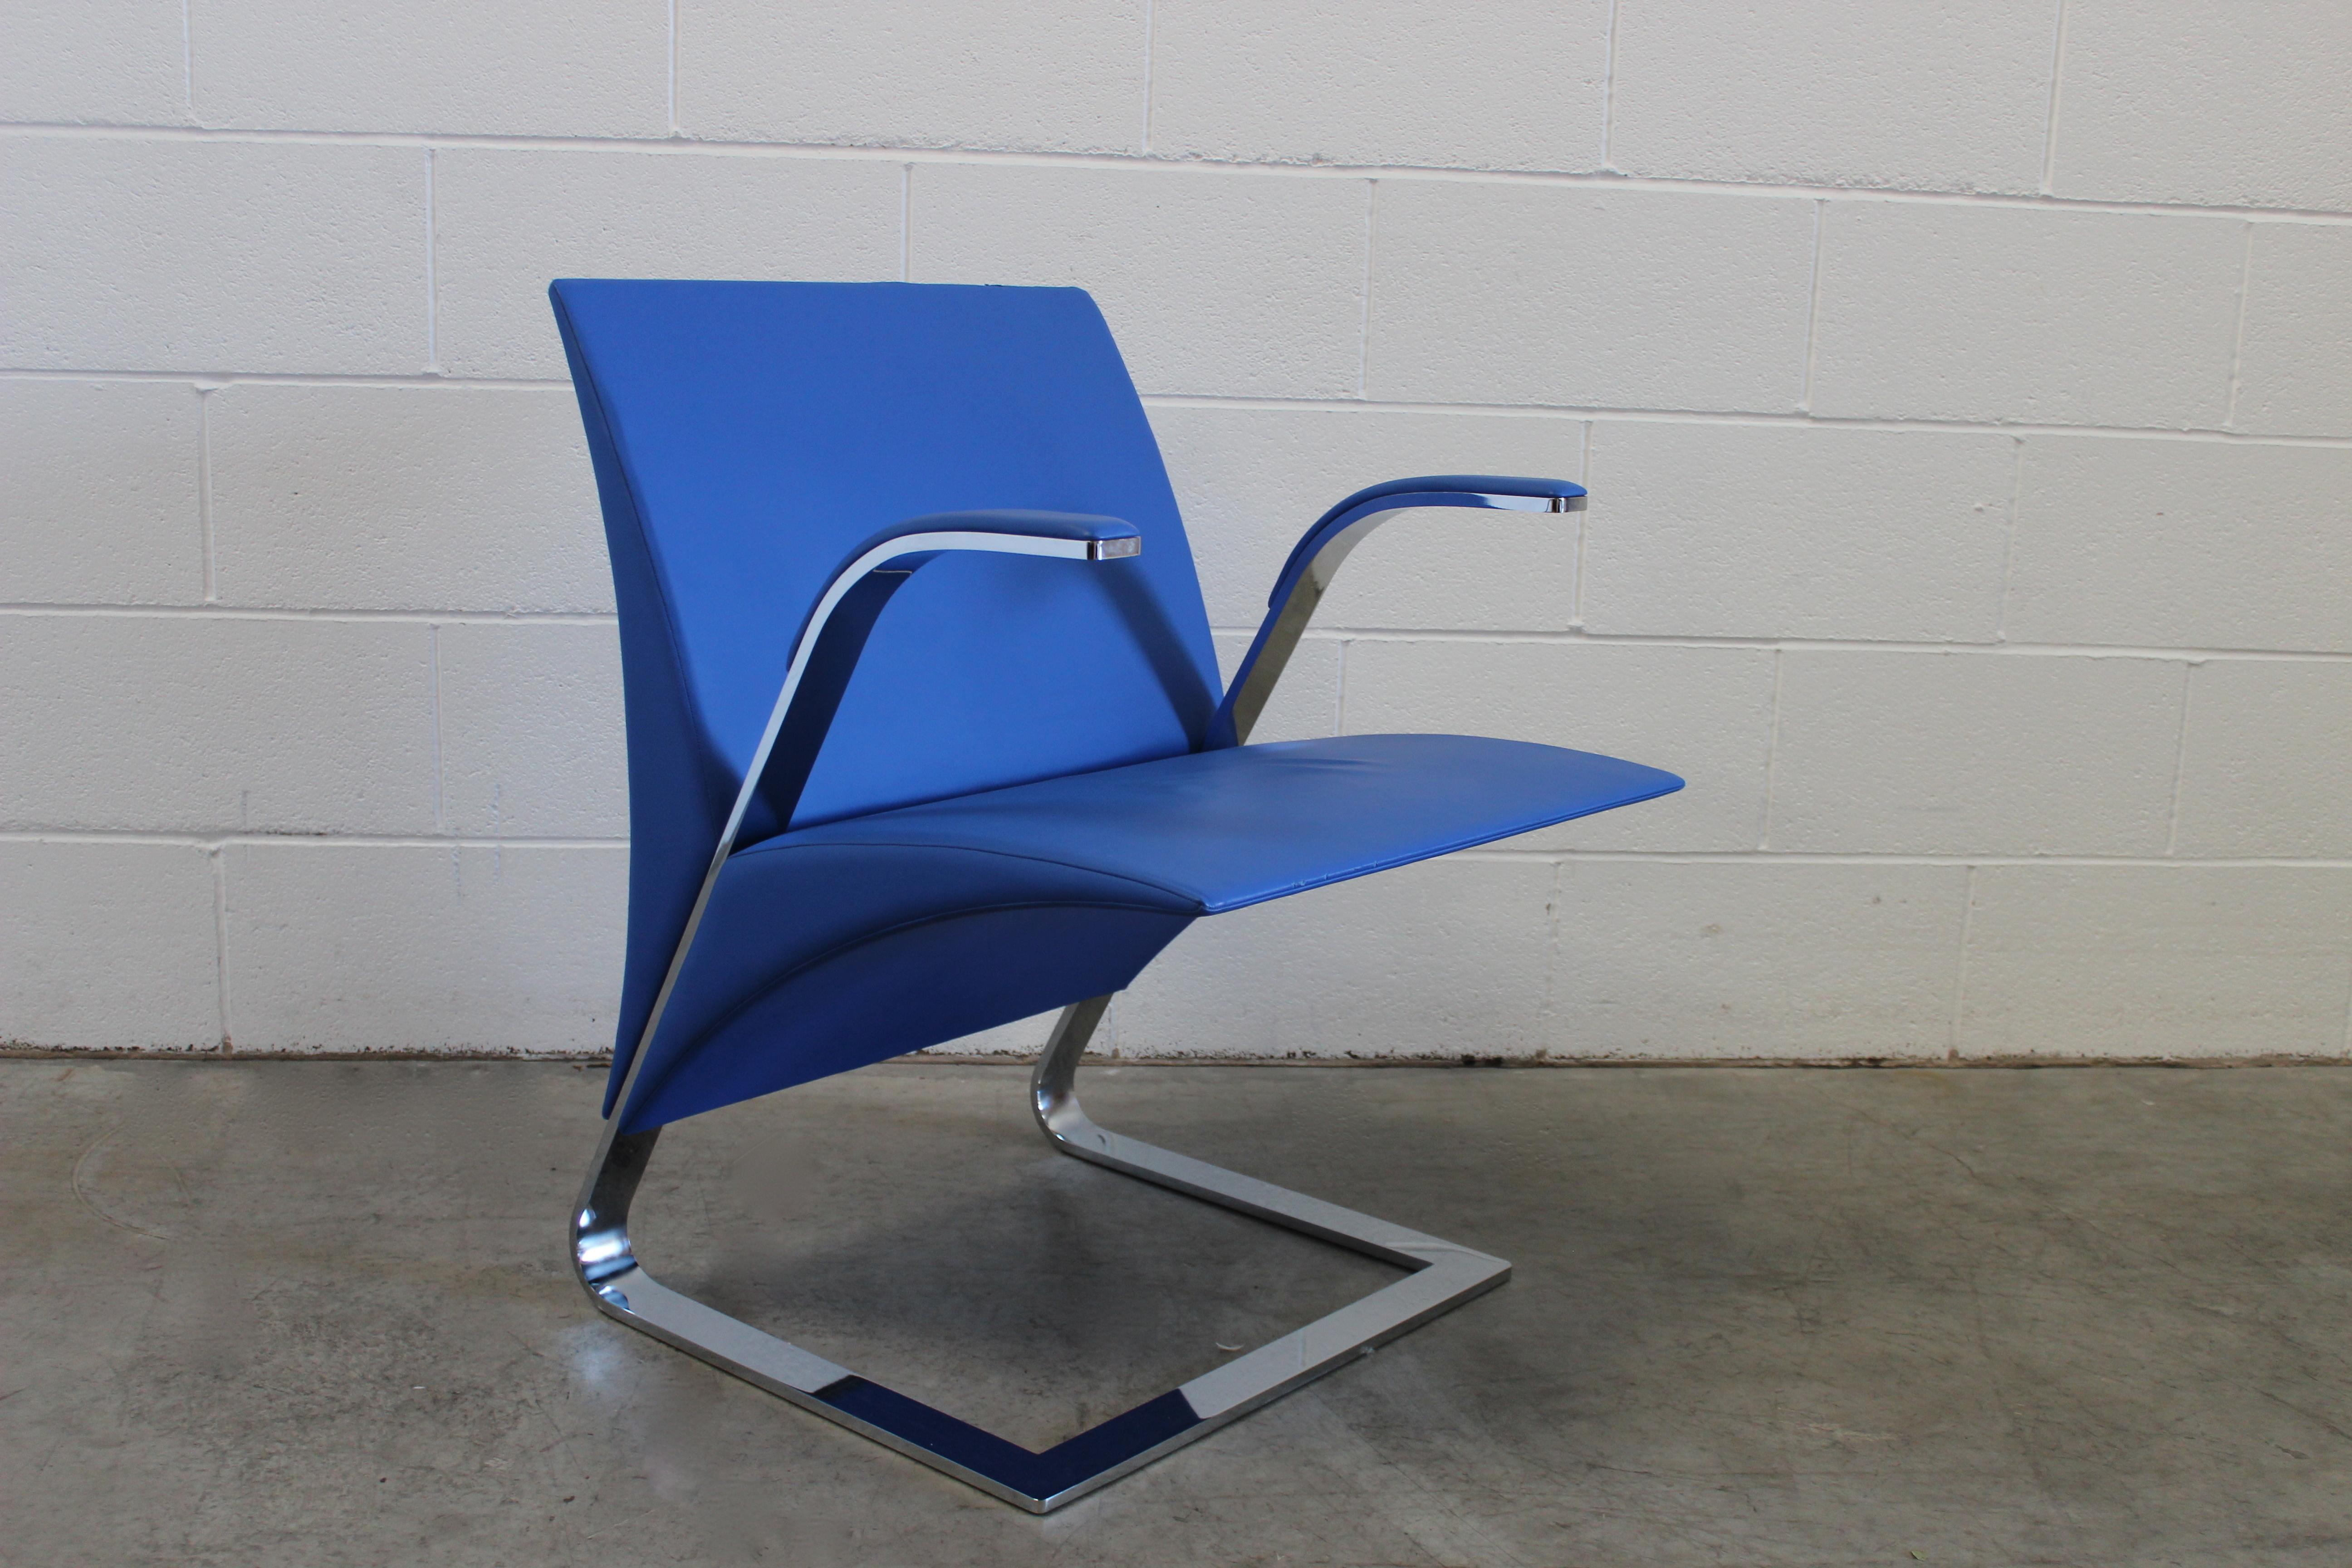 Poltrona Frau Ravello.Sublime Poltrona Frau Ravello Armchair In Pristine Pelle Frau Blue Leather